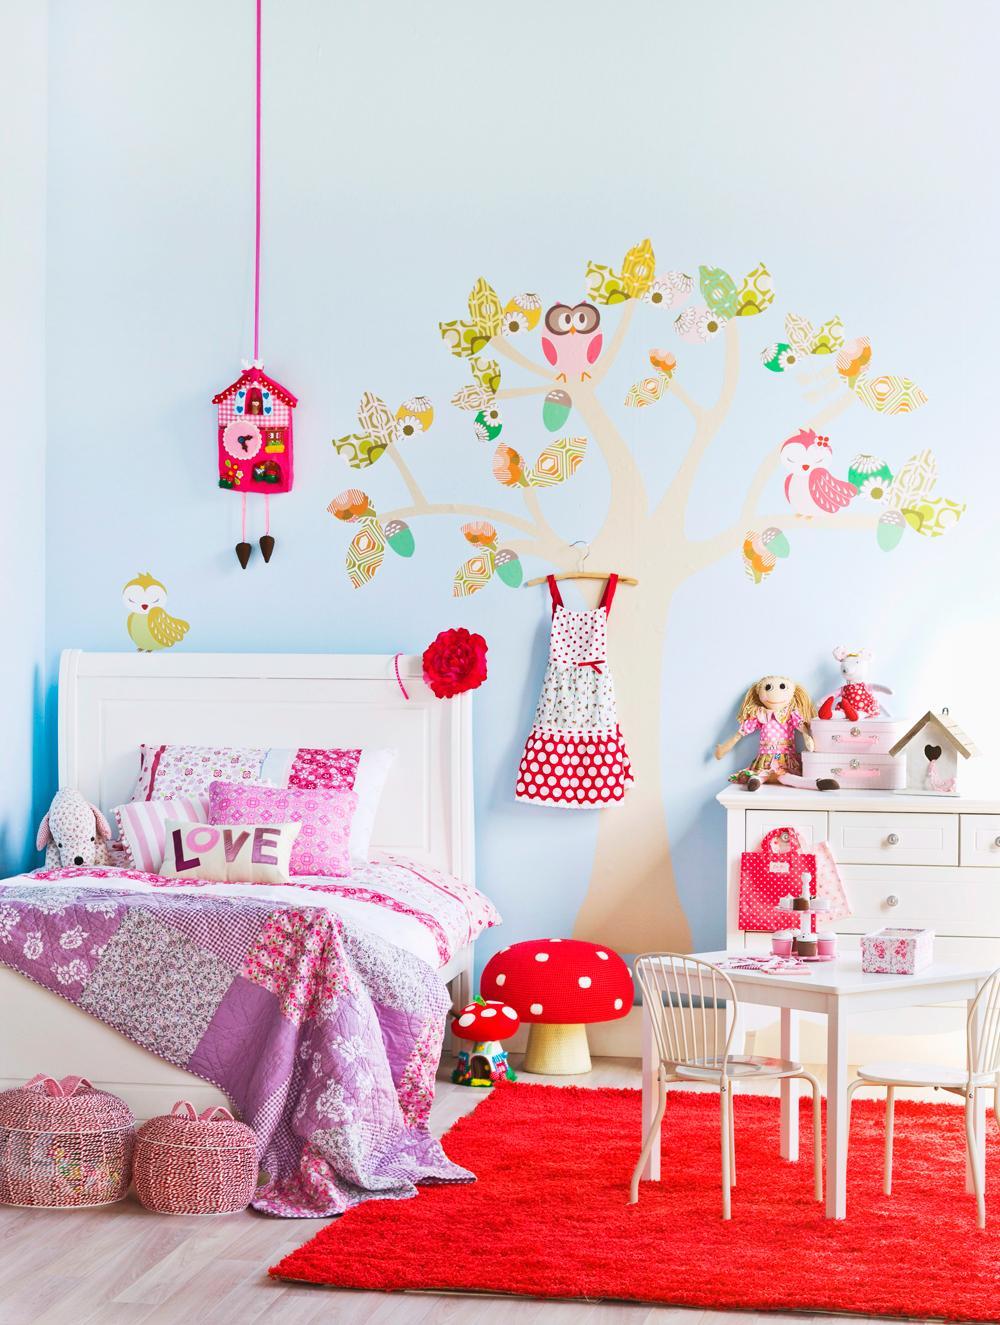 Bezaubernde Kinderzimmer